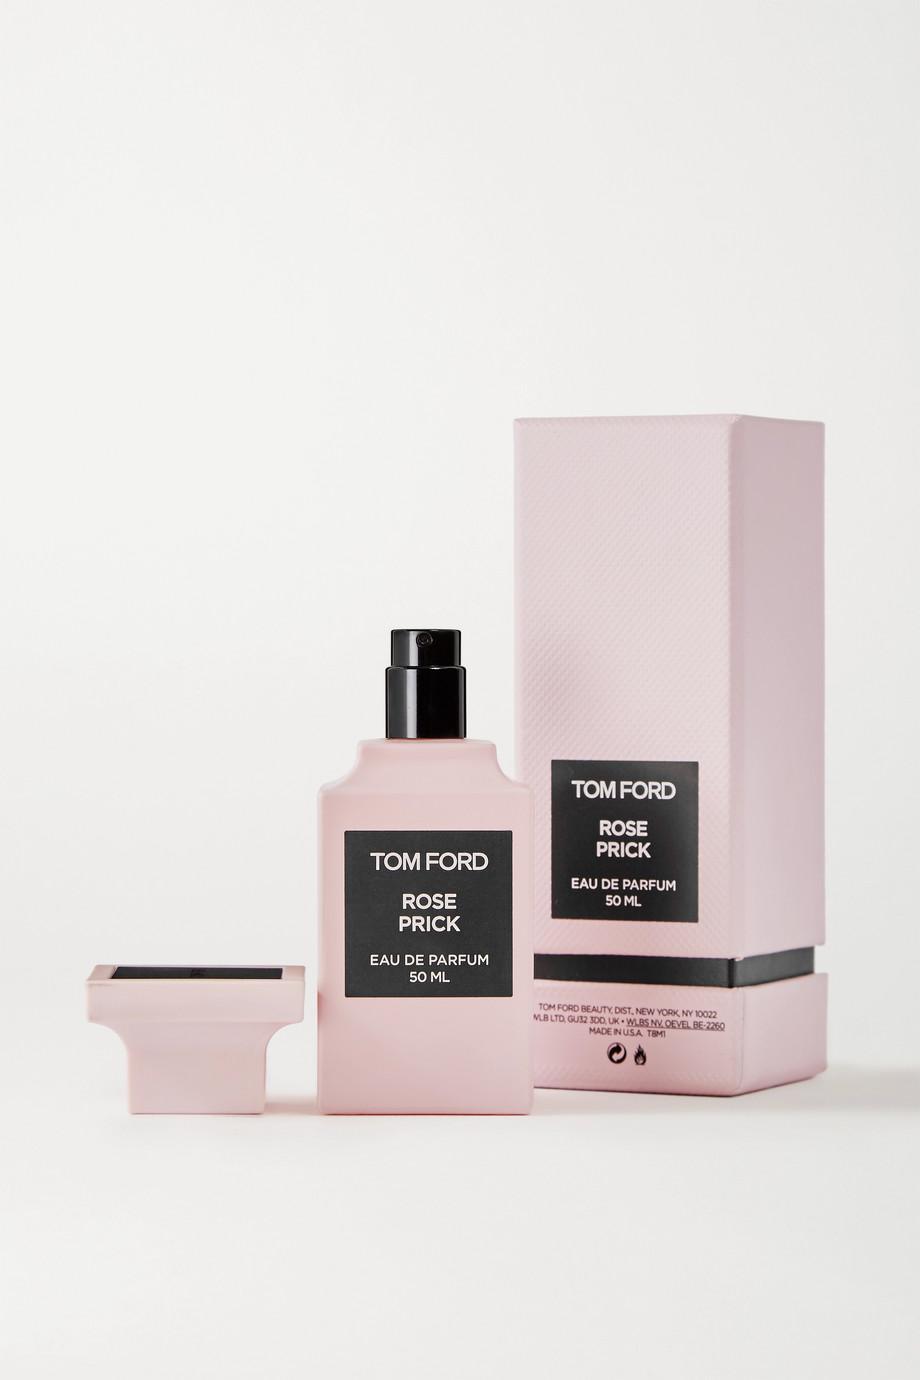 TOM FORD BEAUTY Eau de Parfum - Rose Prick, 50ml